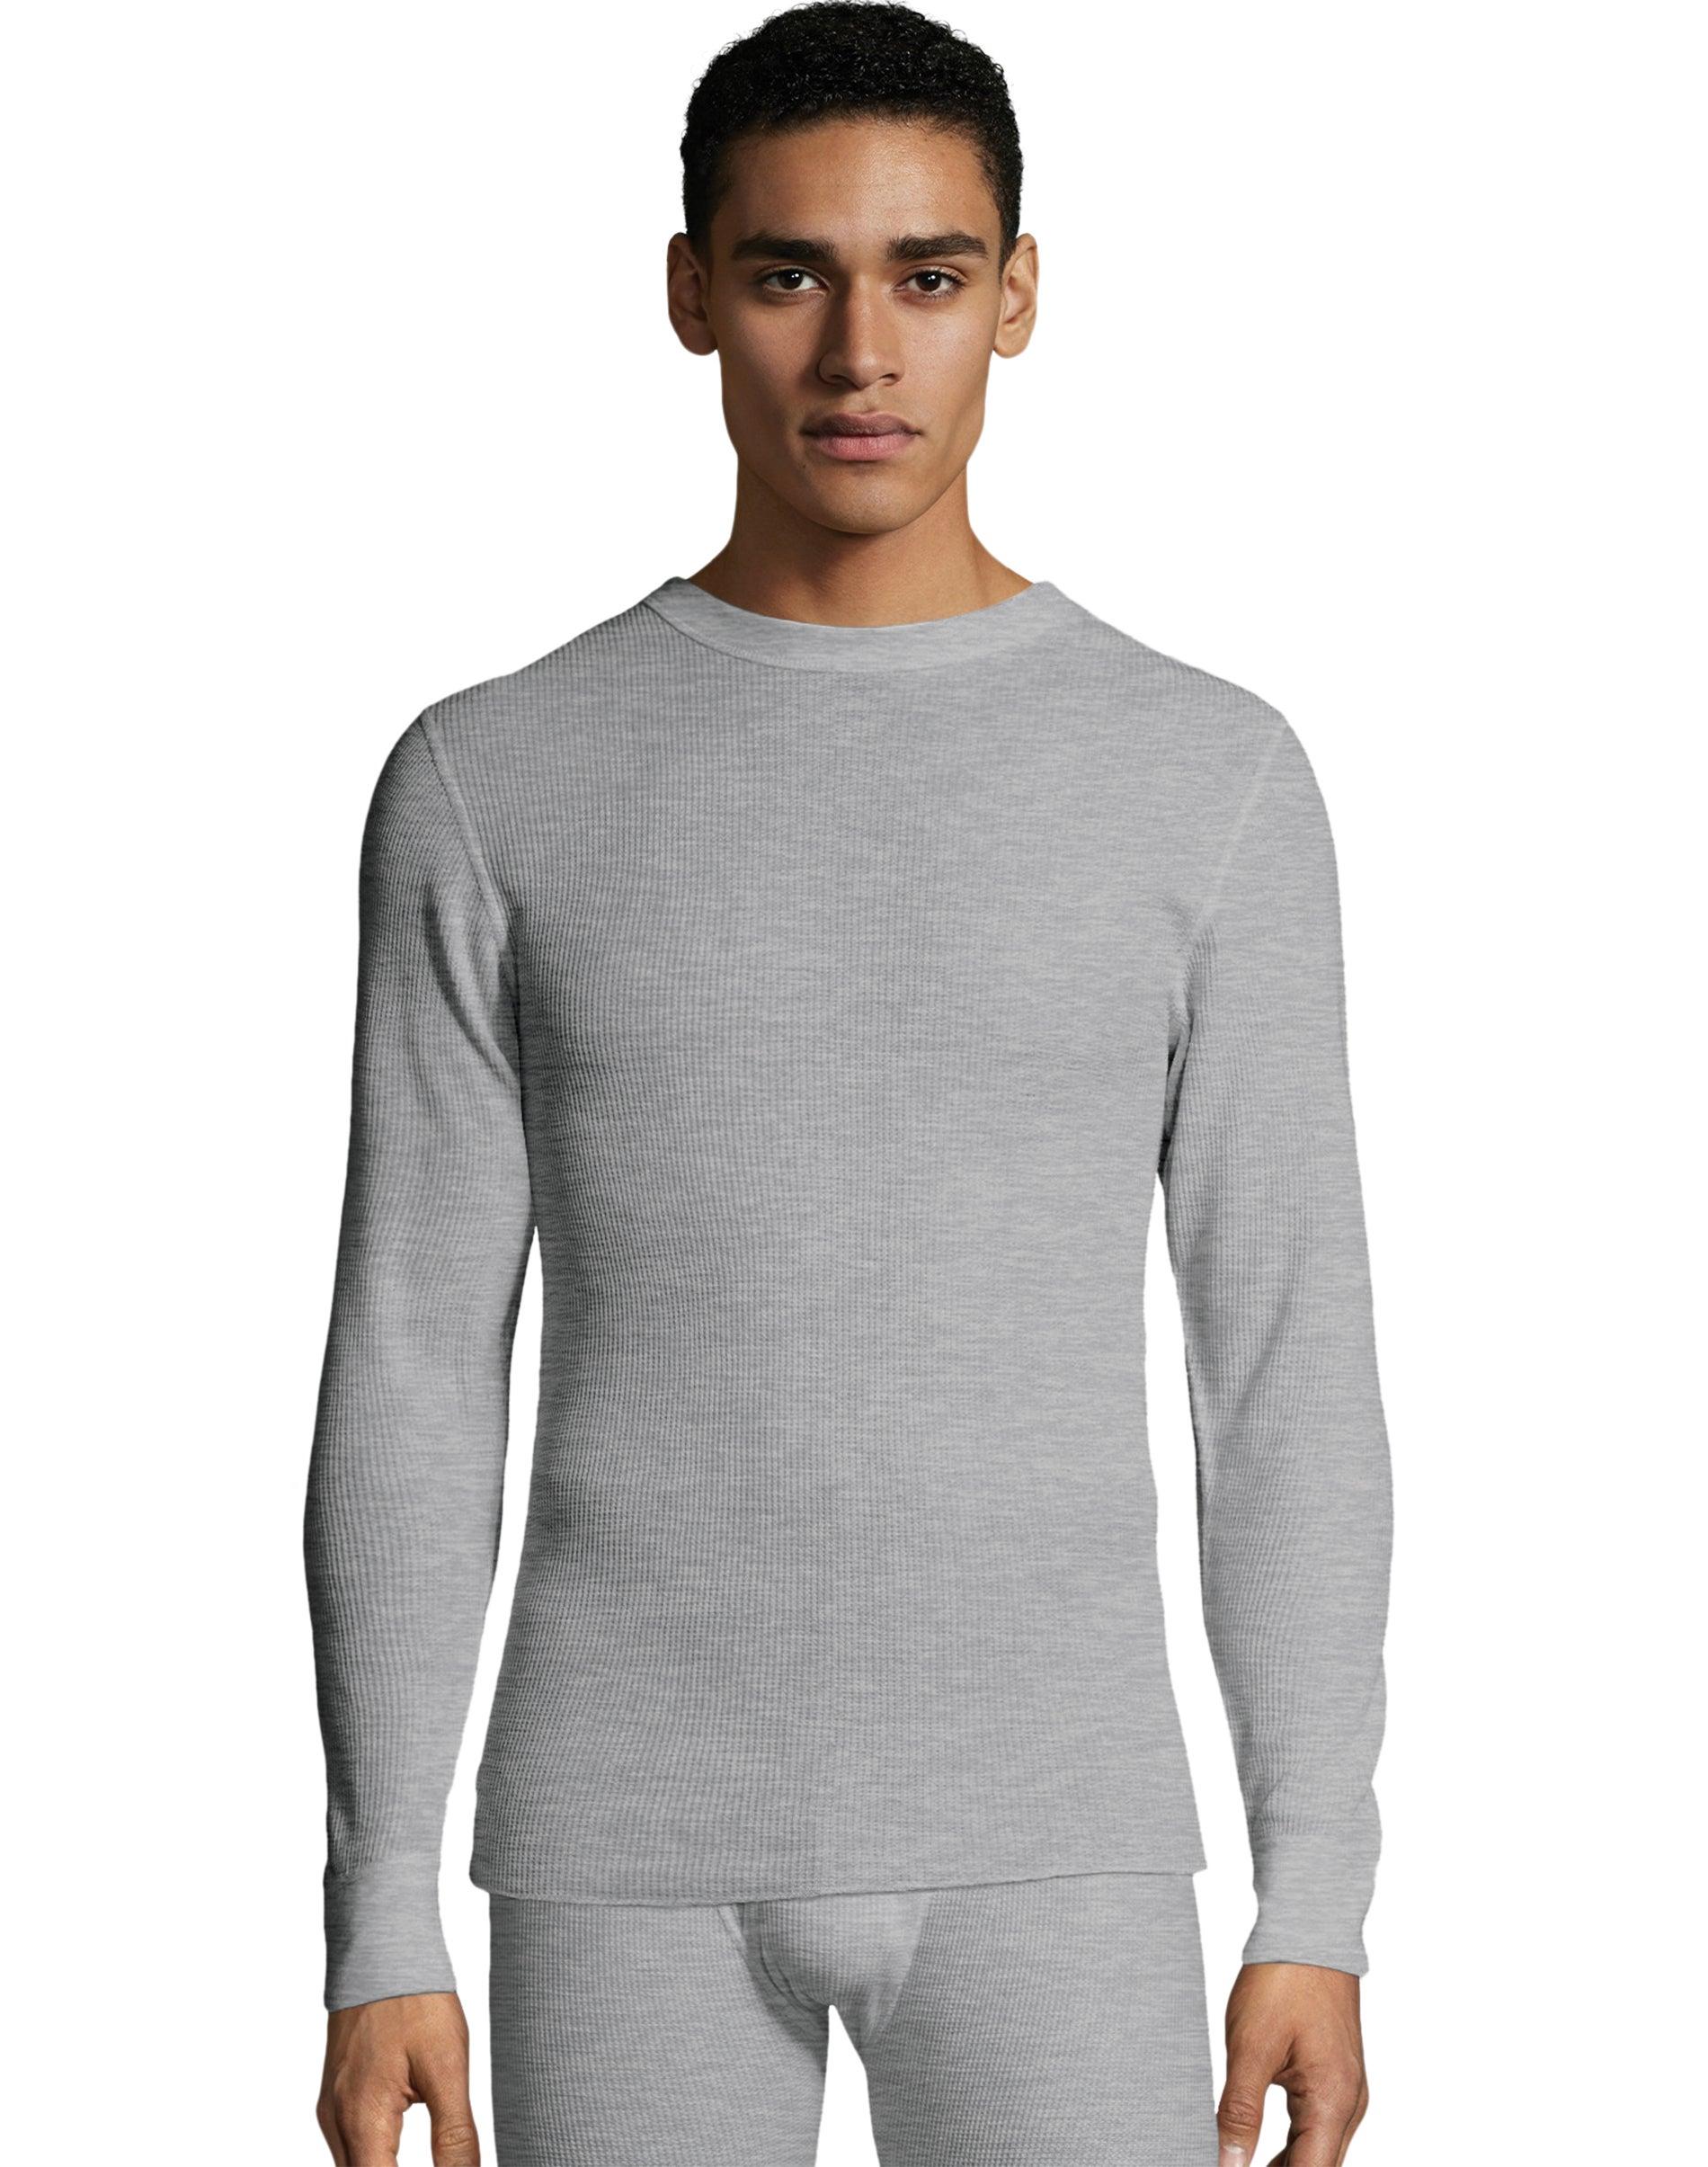 Details about  /Hanes Mens Navy Thermal Crew Neck Top ~ Underwear ~ Medium